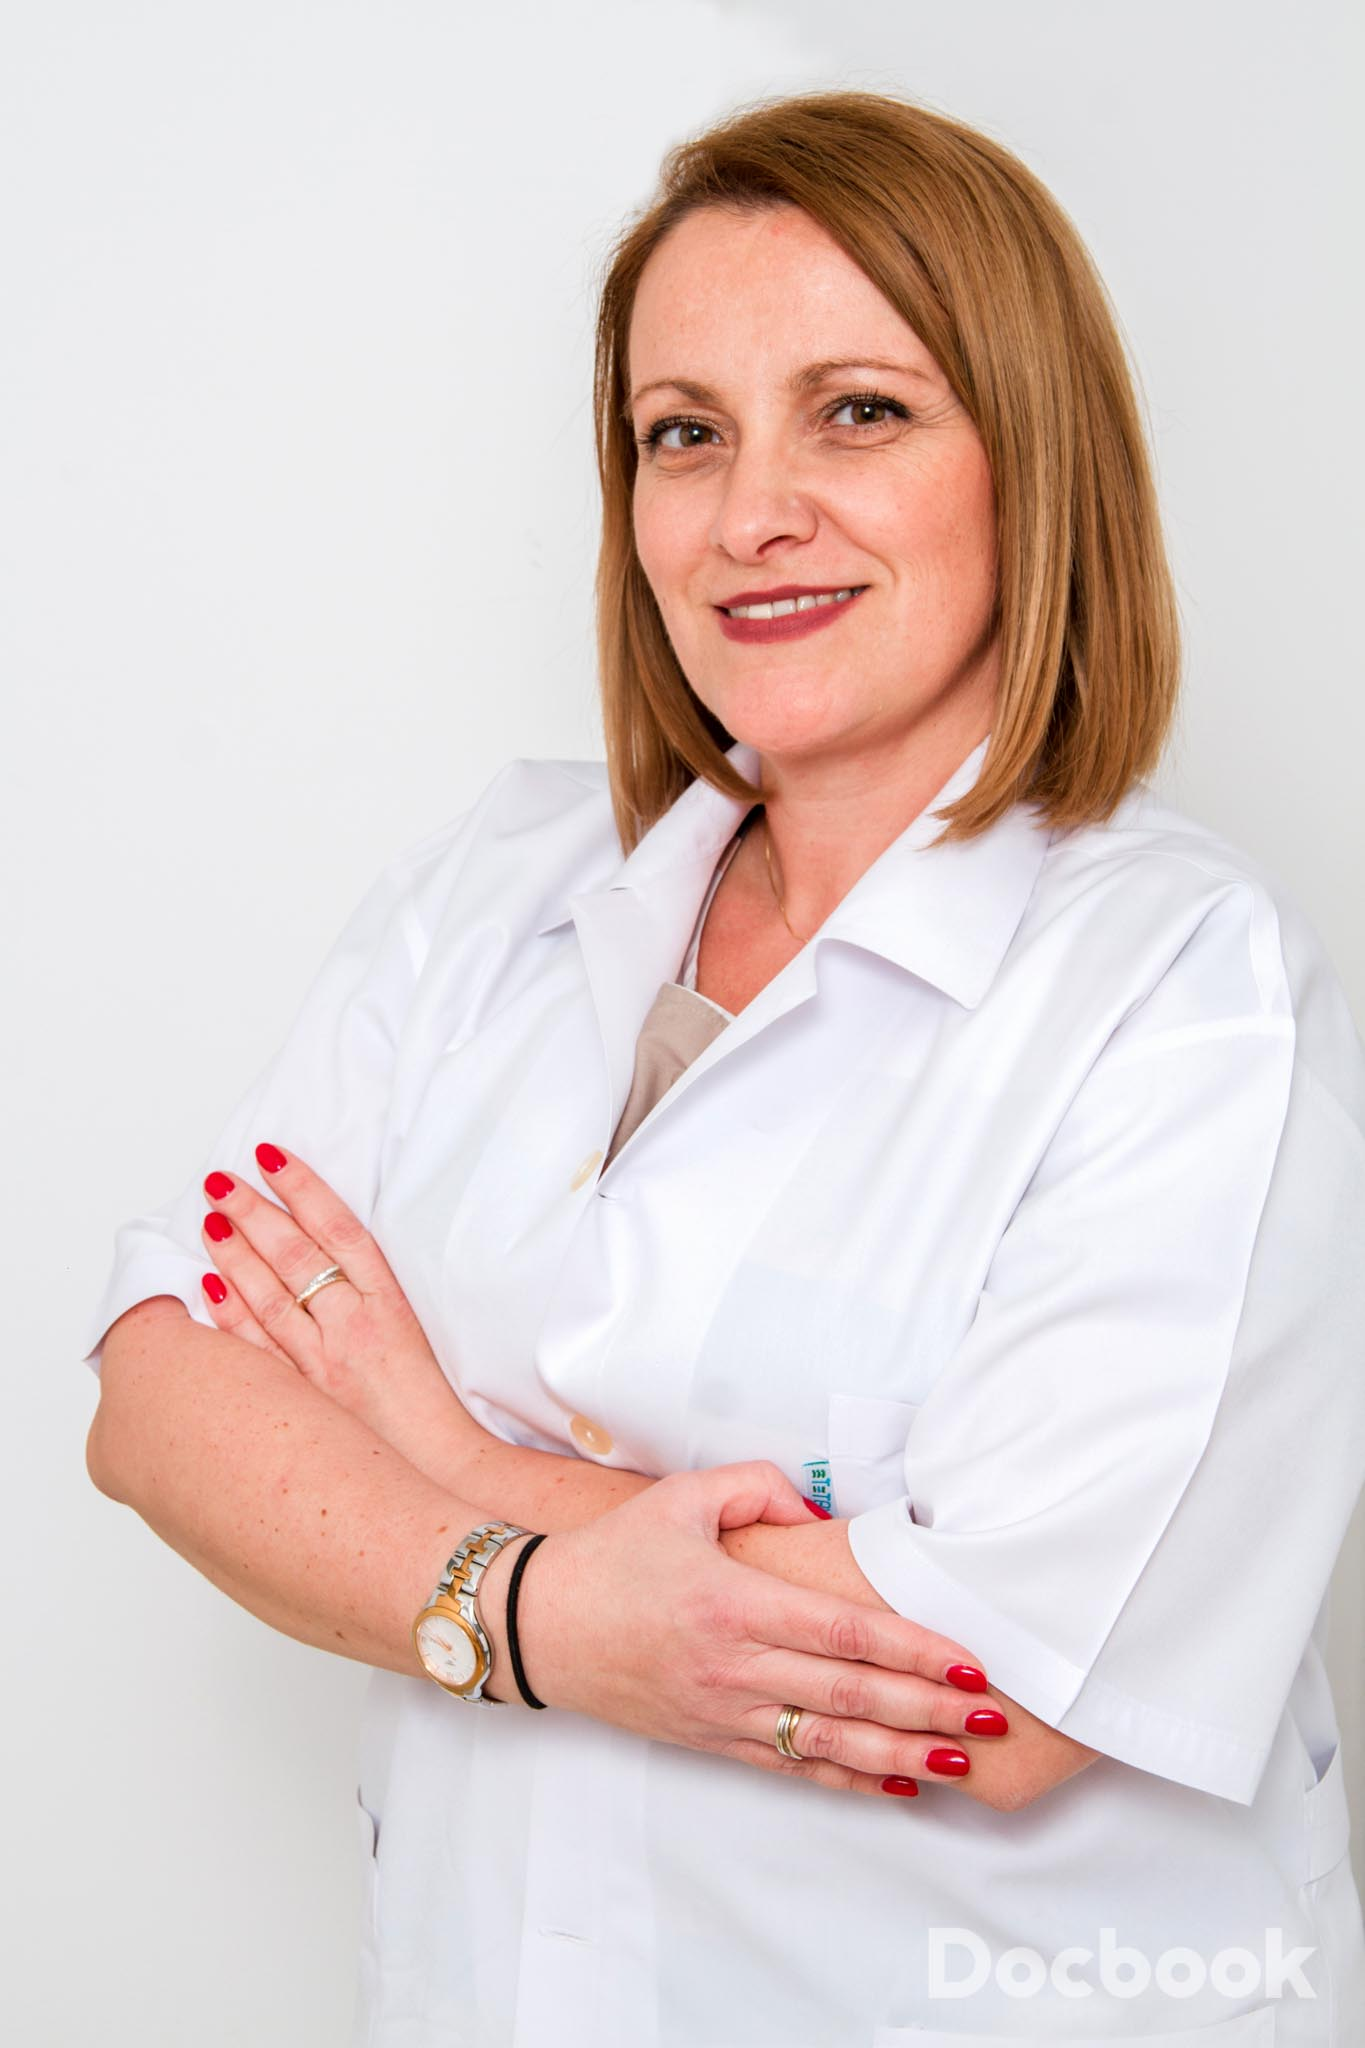 Dr. Andreea Gornic